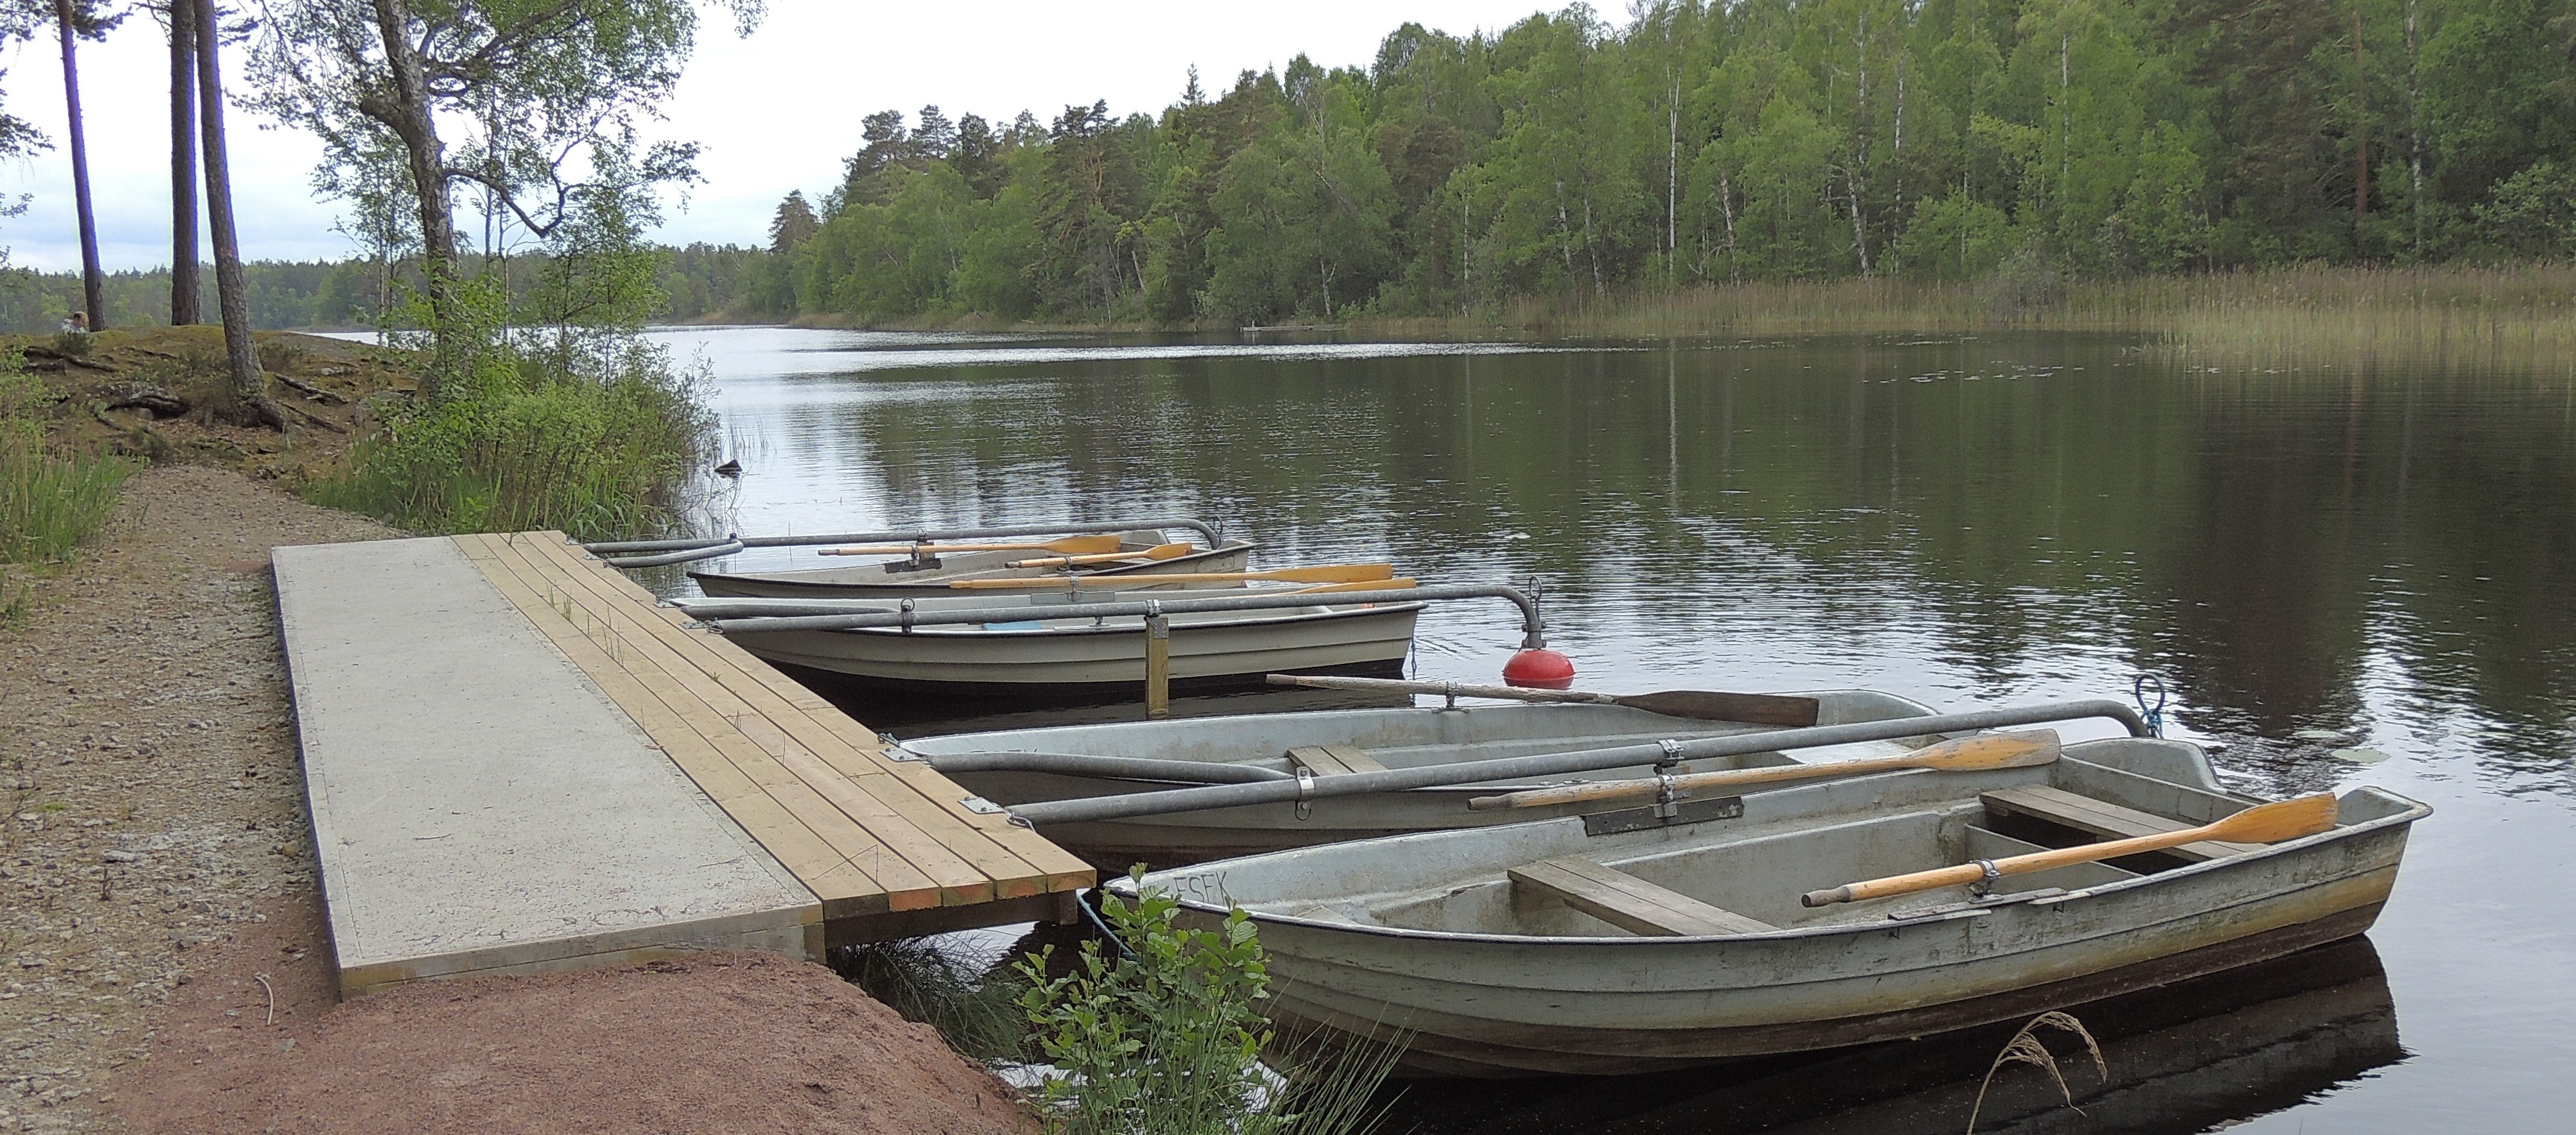 Båtbryggan vid Stora Hällesjön.